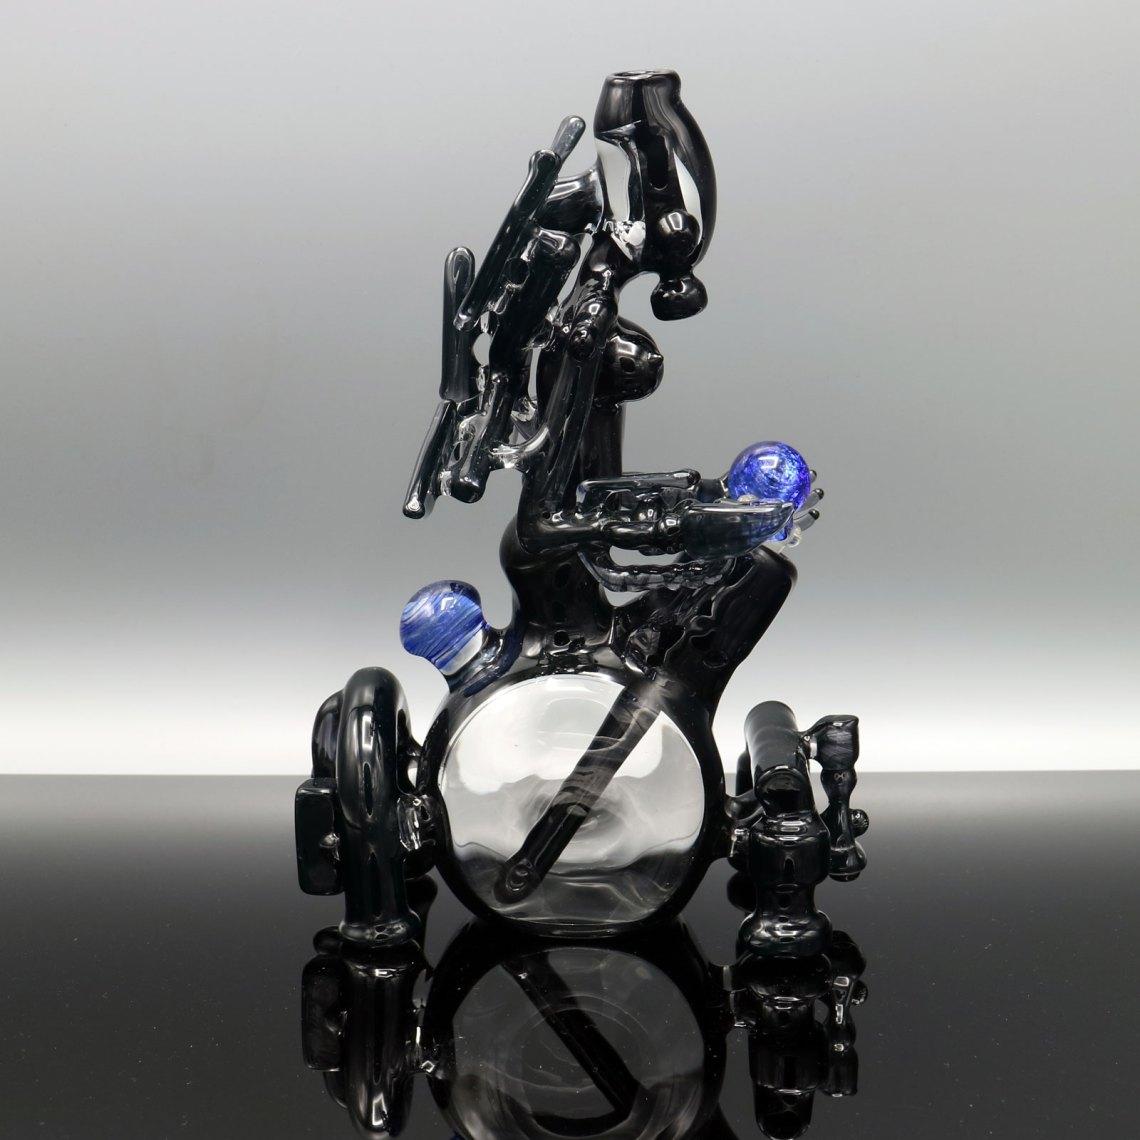 Kiebler – Fairymech Functional Sculpture